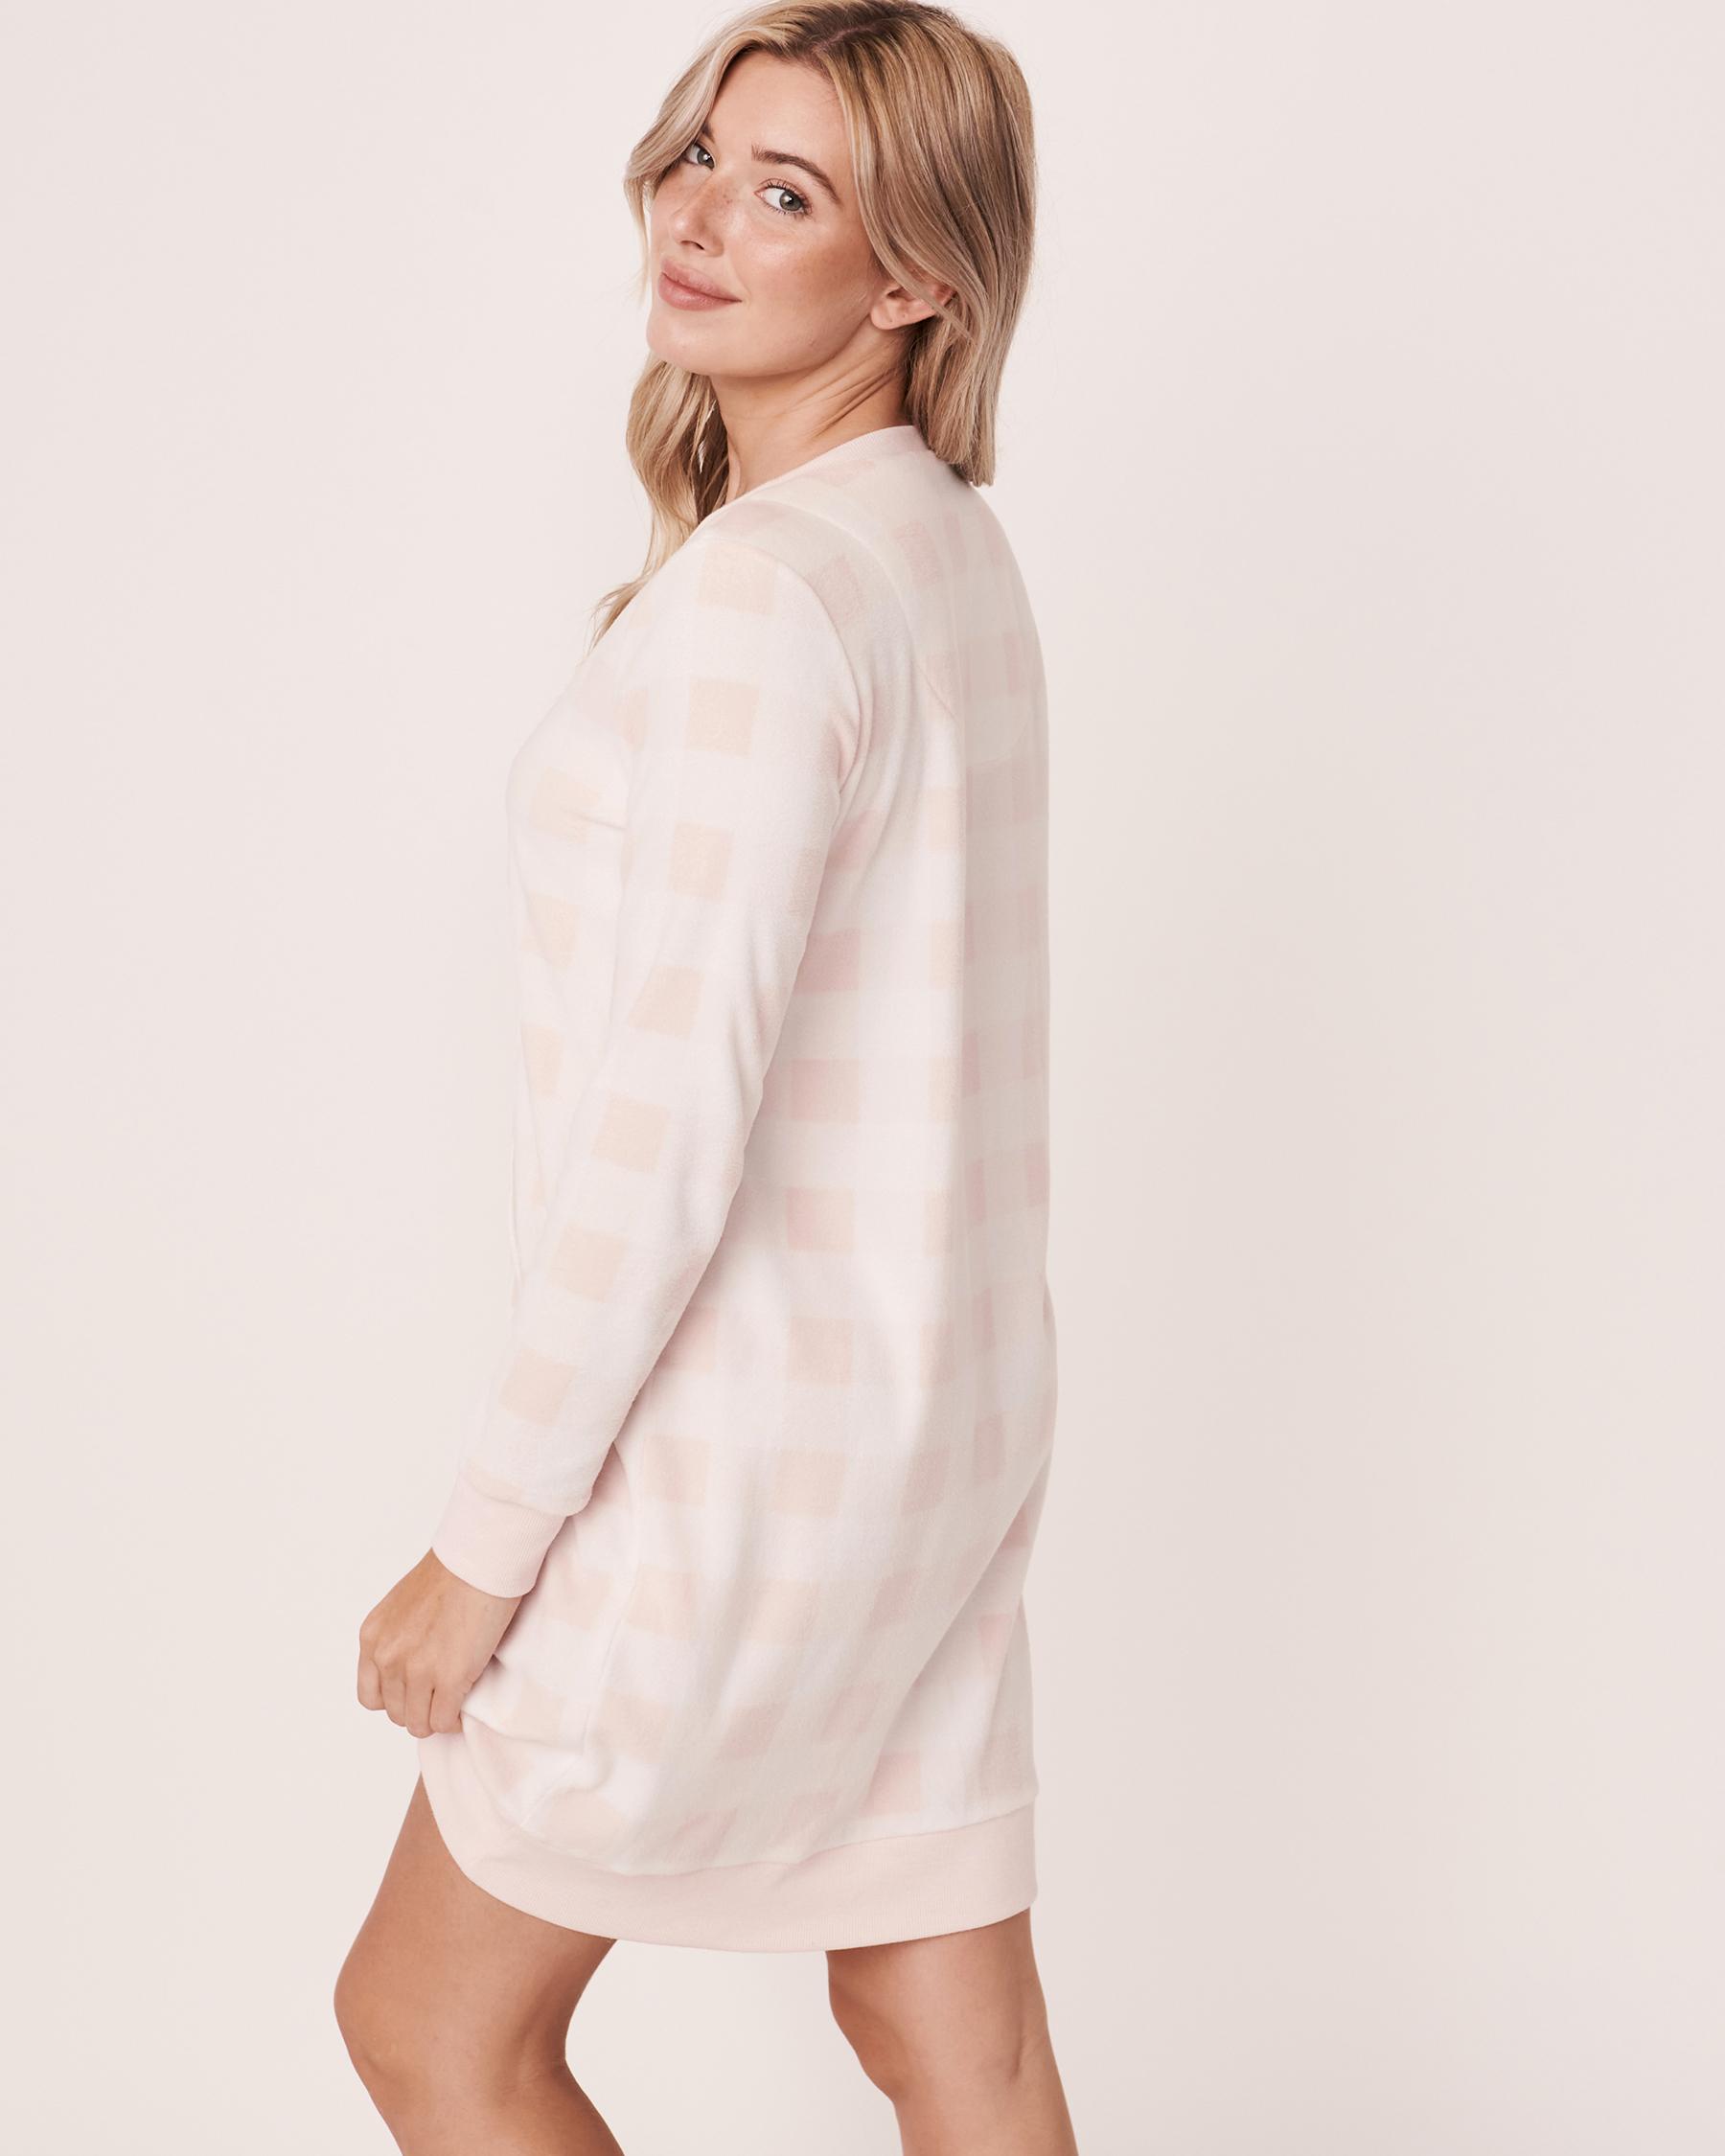 LA VIE EN ROSE Micropolar Long Sleeve Sleepshirt Pink vichy plaid 40500098 - View3